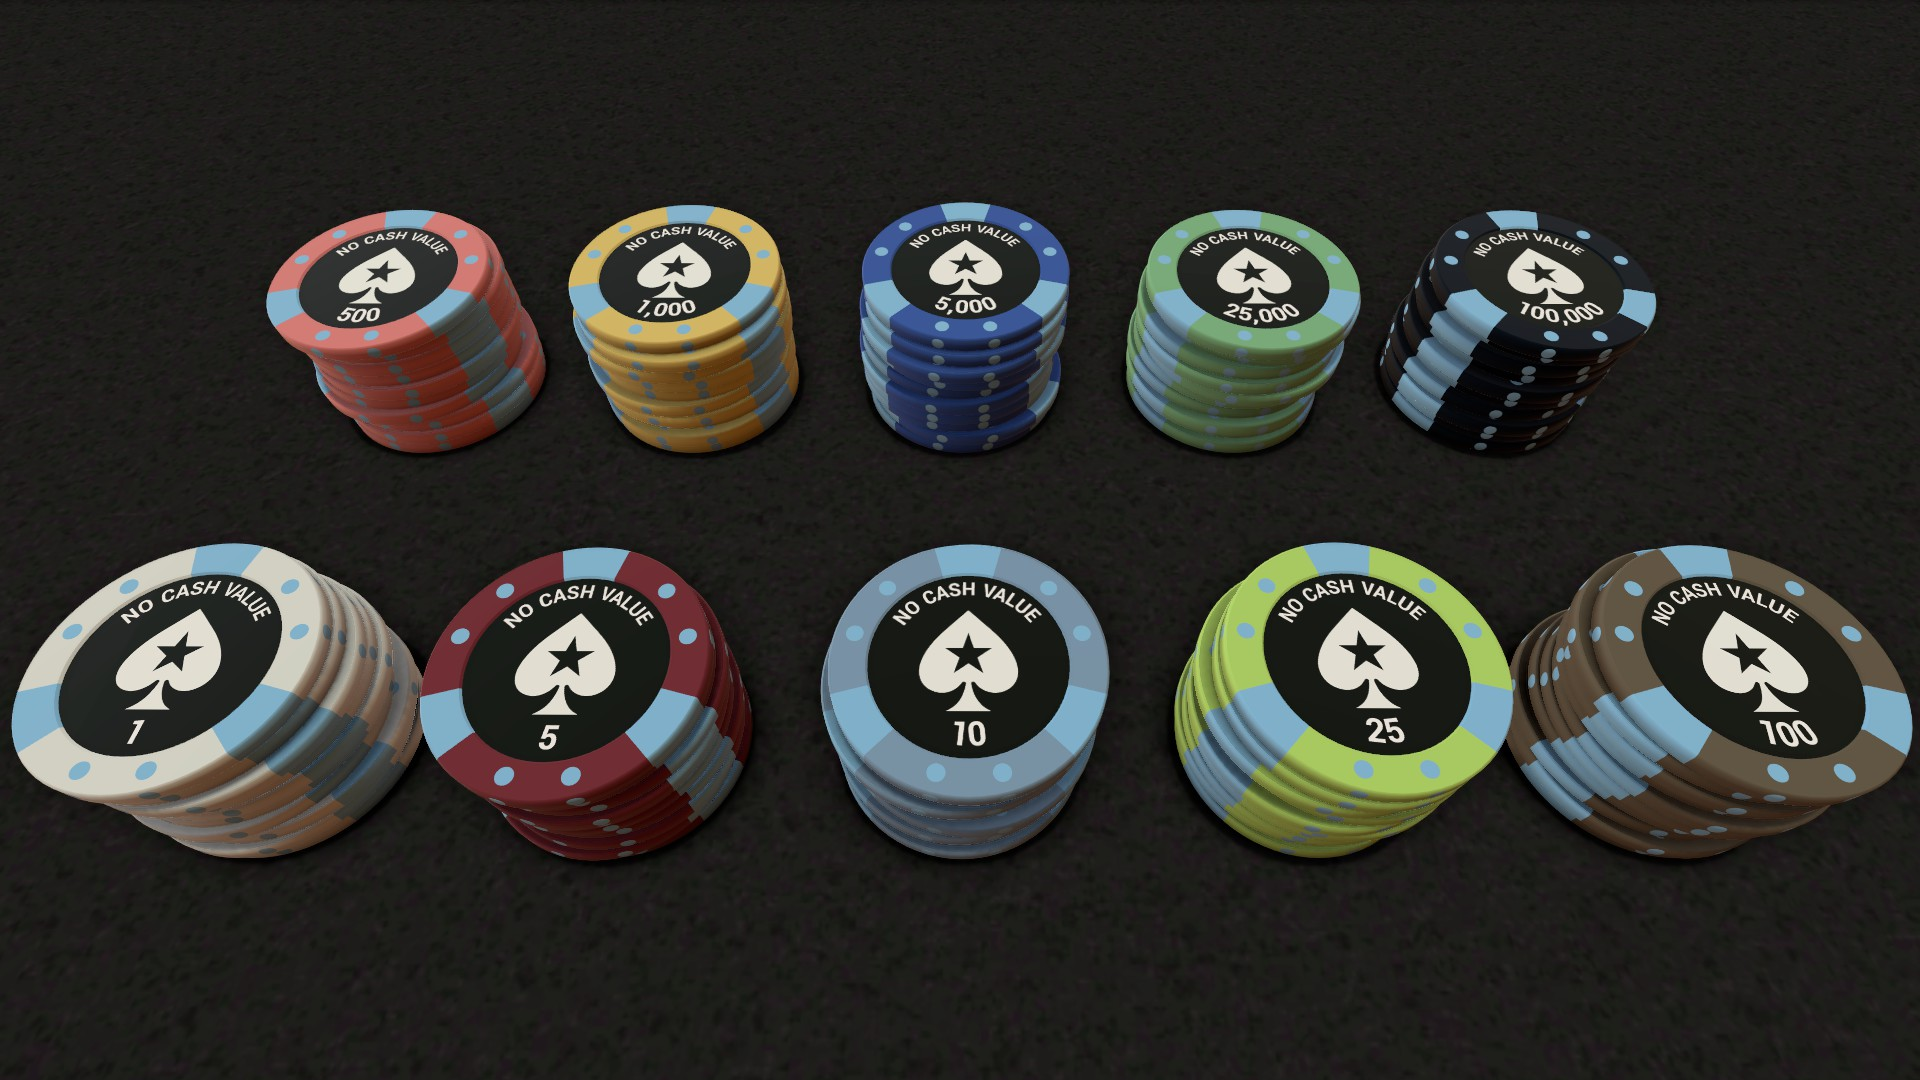 Steam poker reddit procter and gamble financial ratio analysis